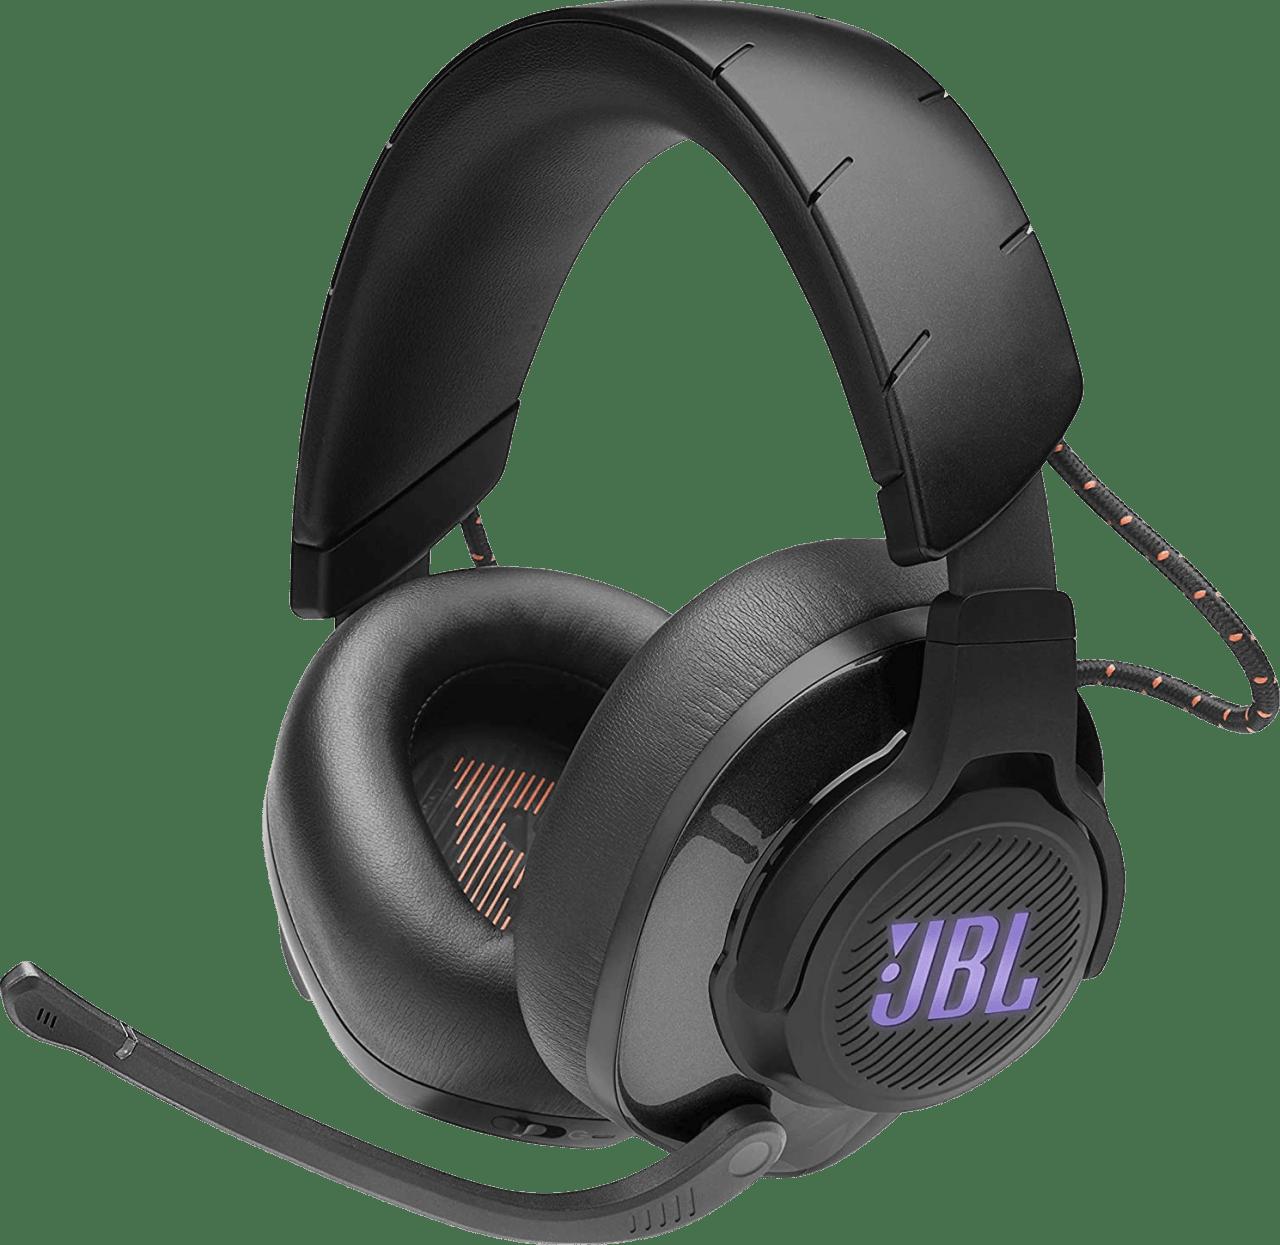 Black JBL Quantum 600 Over-ear Gaming Headphones.1